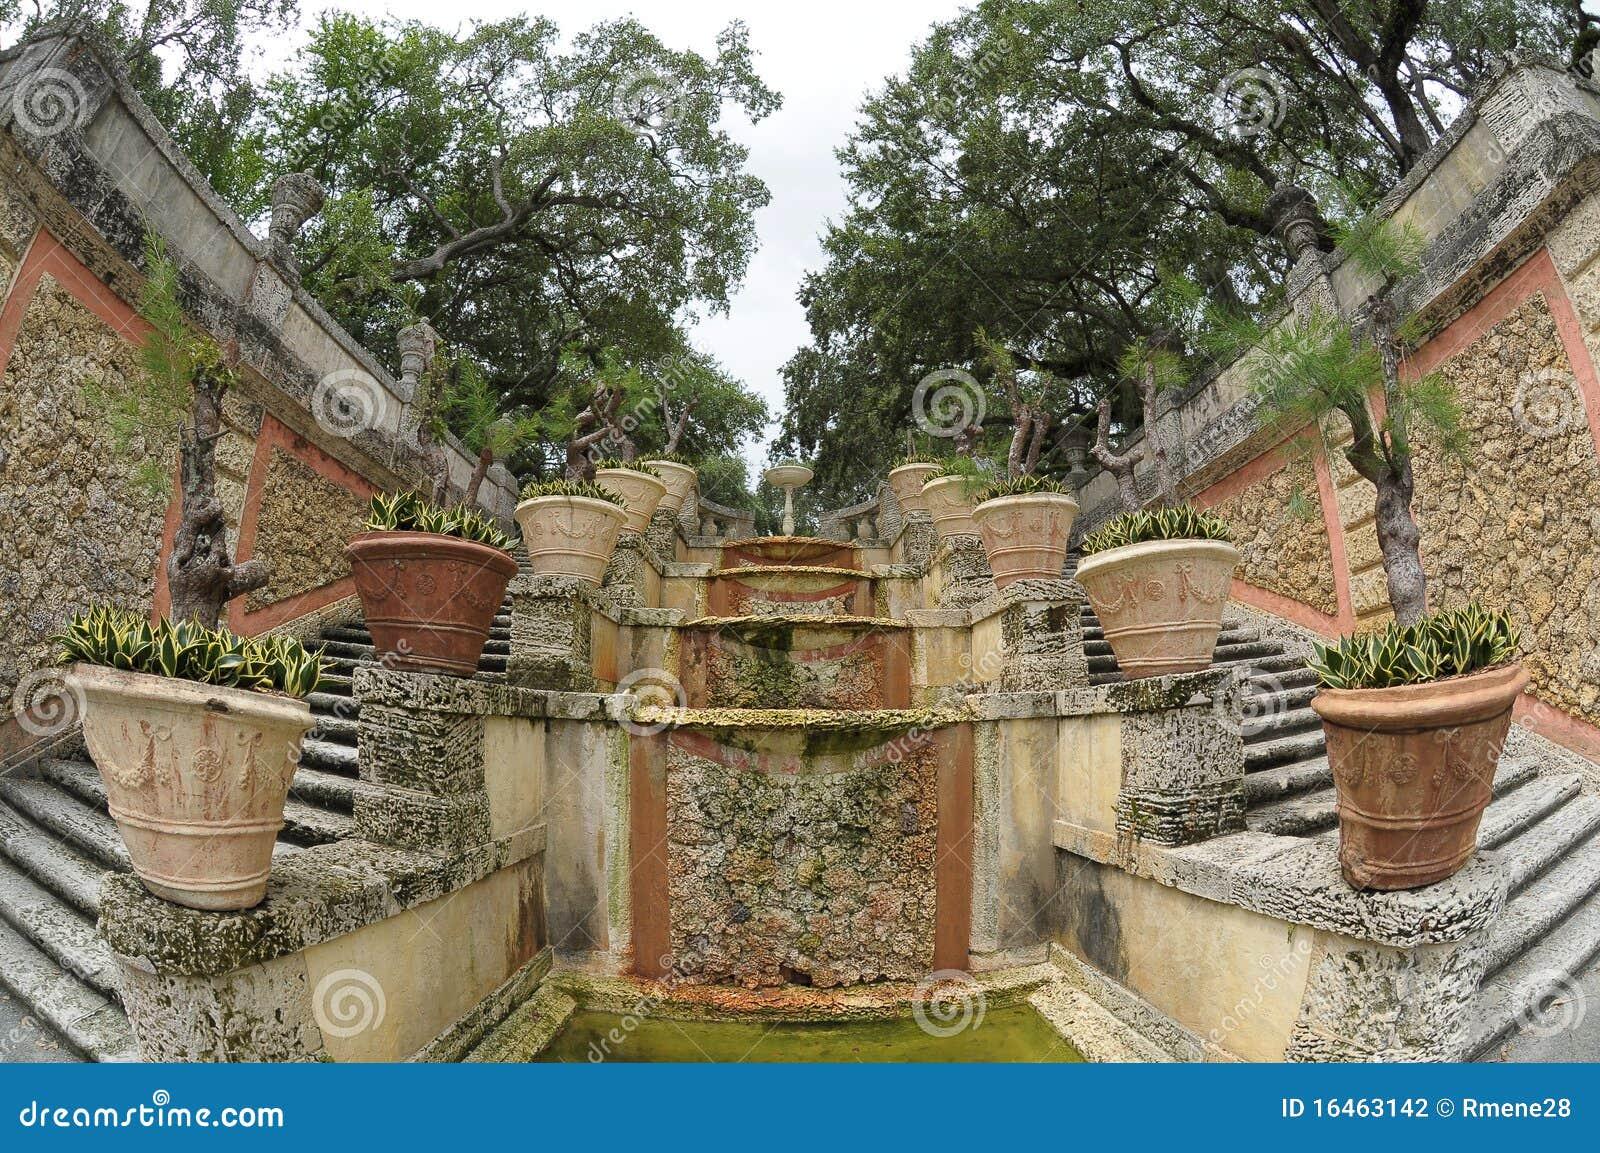 Vizcaya gardens stock photo. Image of plants, sunken - 16463142